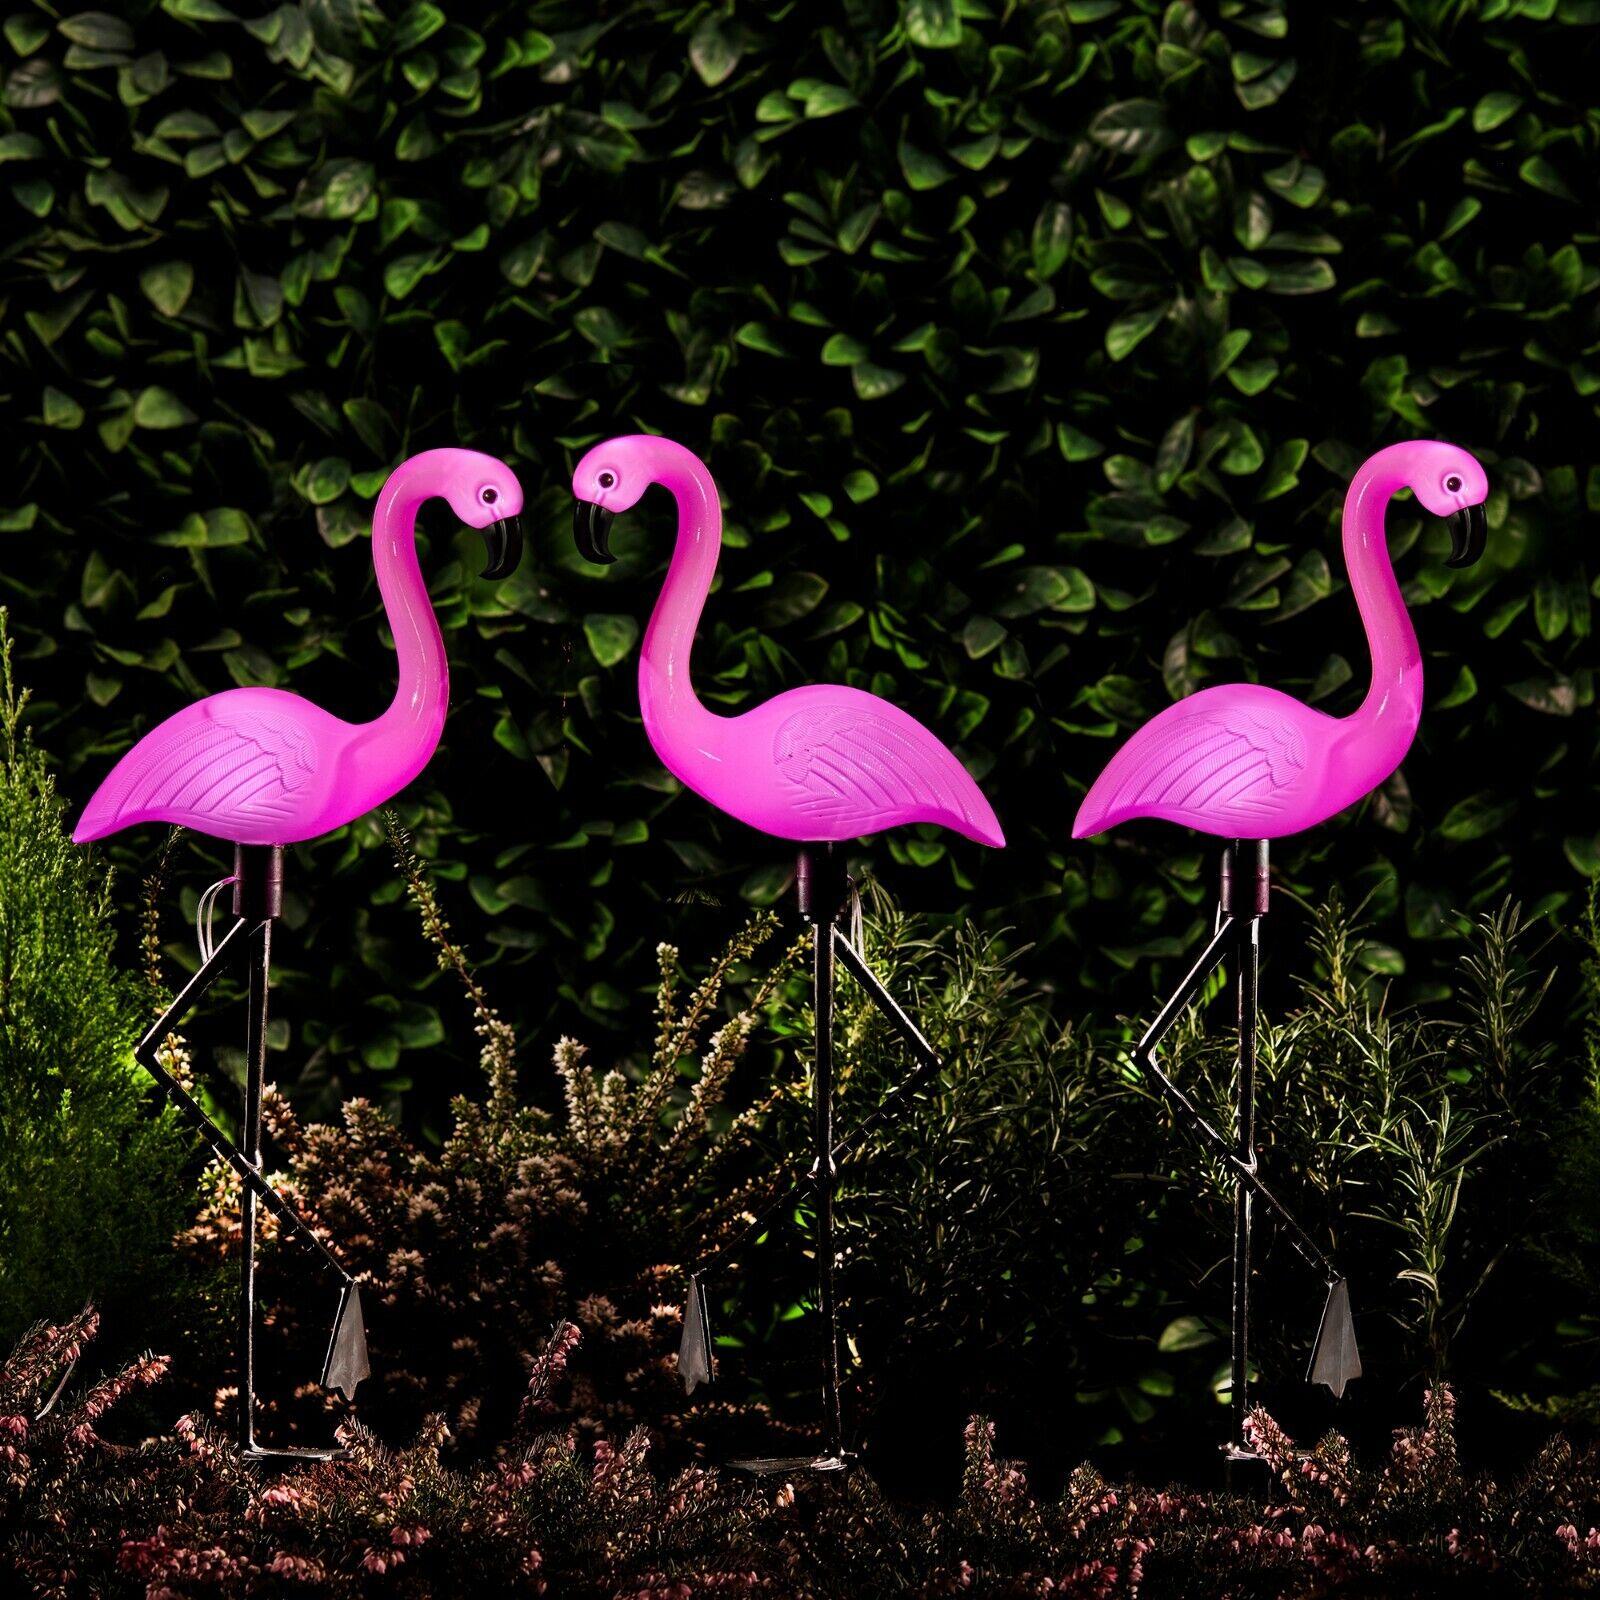 Flamingo SOLAR STYLE Solar Powered Garden Flamingo Outdoor Novelty Lighting Weather Resistant